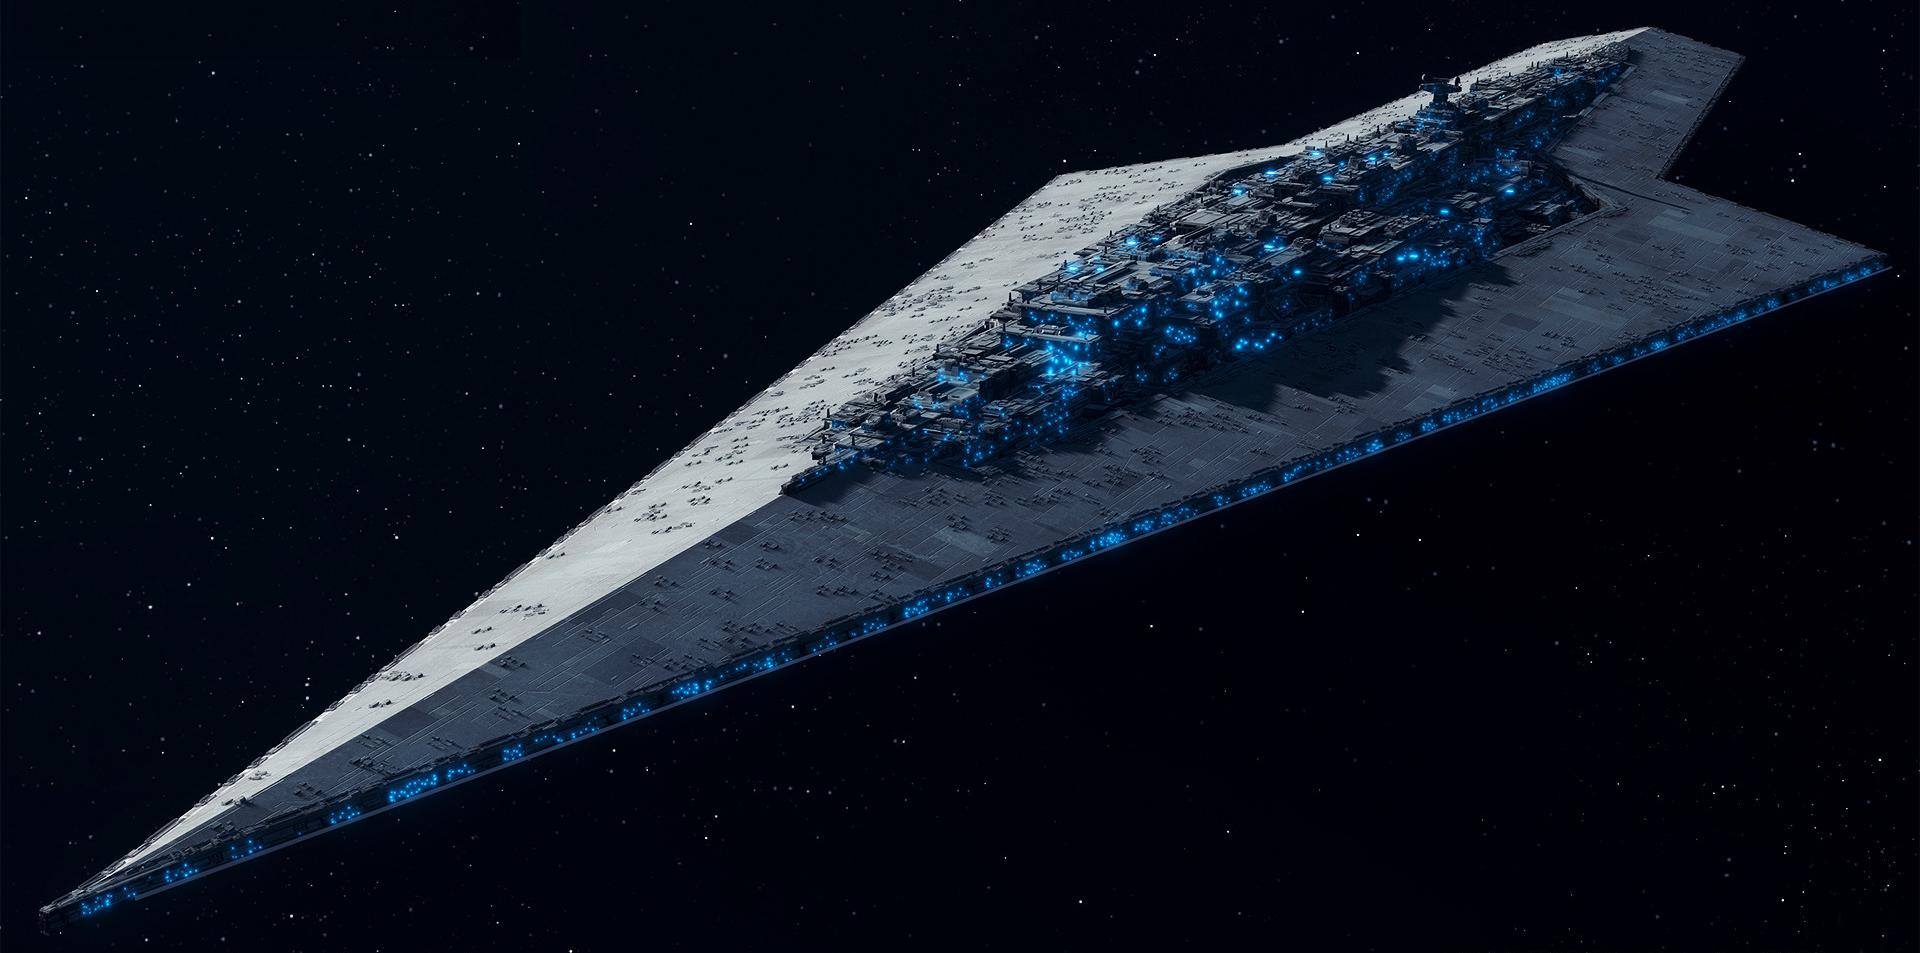 super star destroyer executor